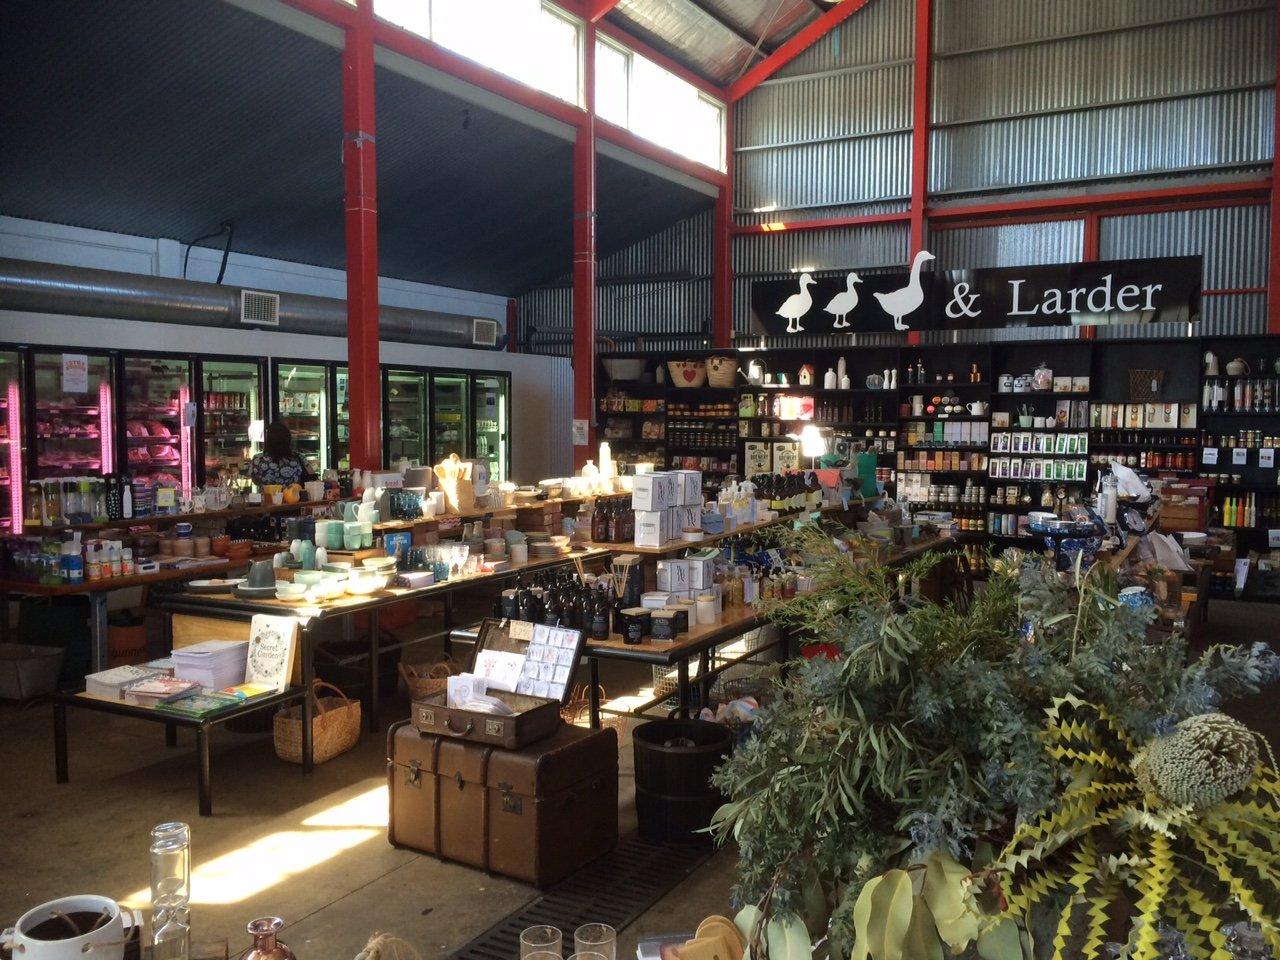 Inside the supermarket - Duck, Duck, Goose and Larder